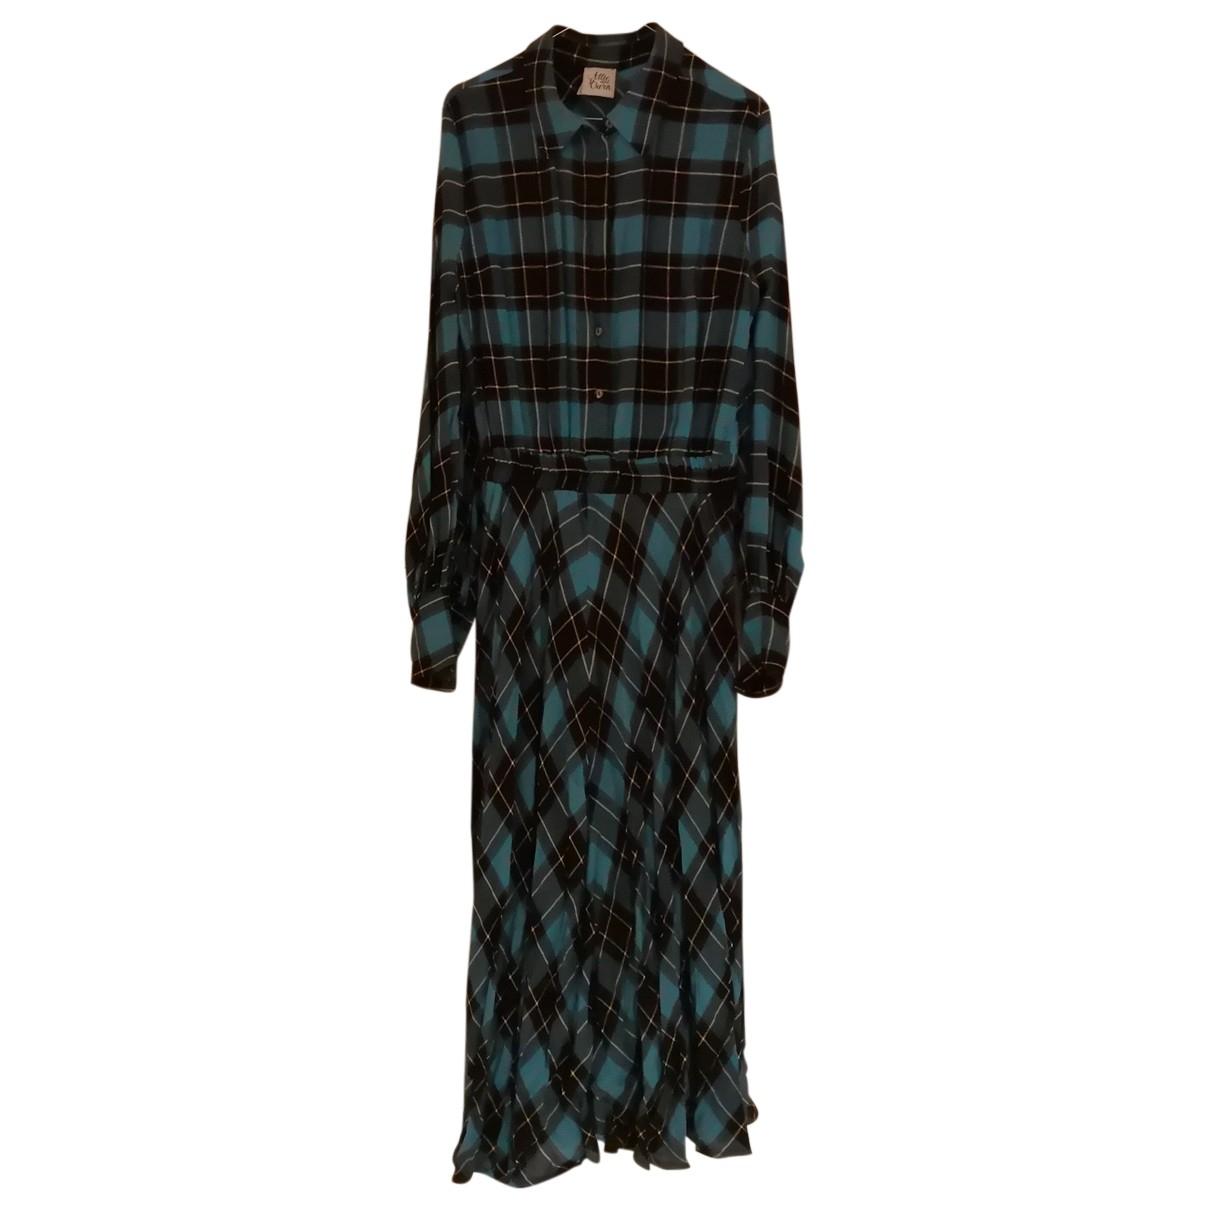 Attic And Barn \N Multicolour dress for Women 44 IT